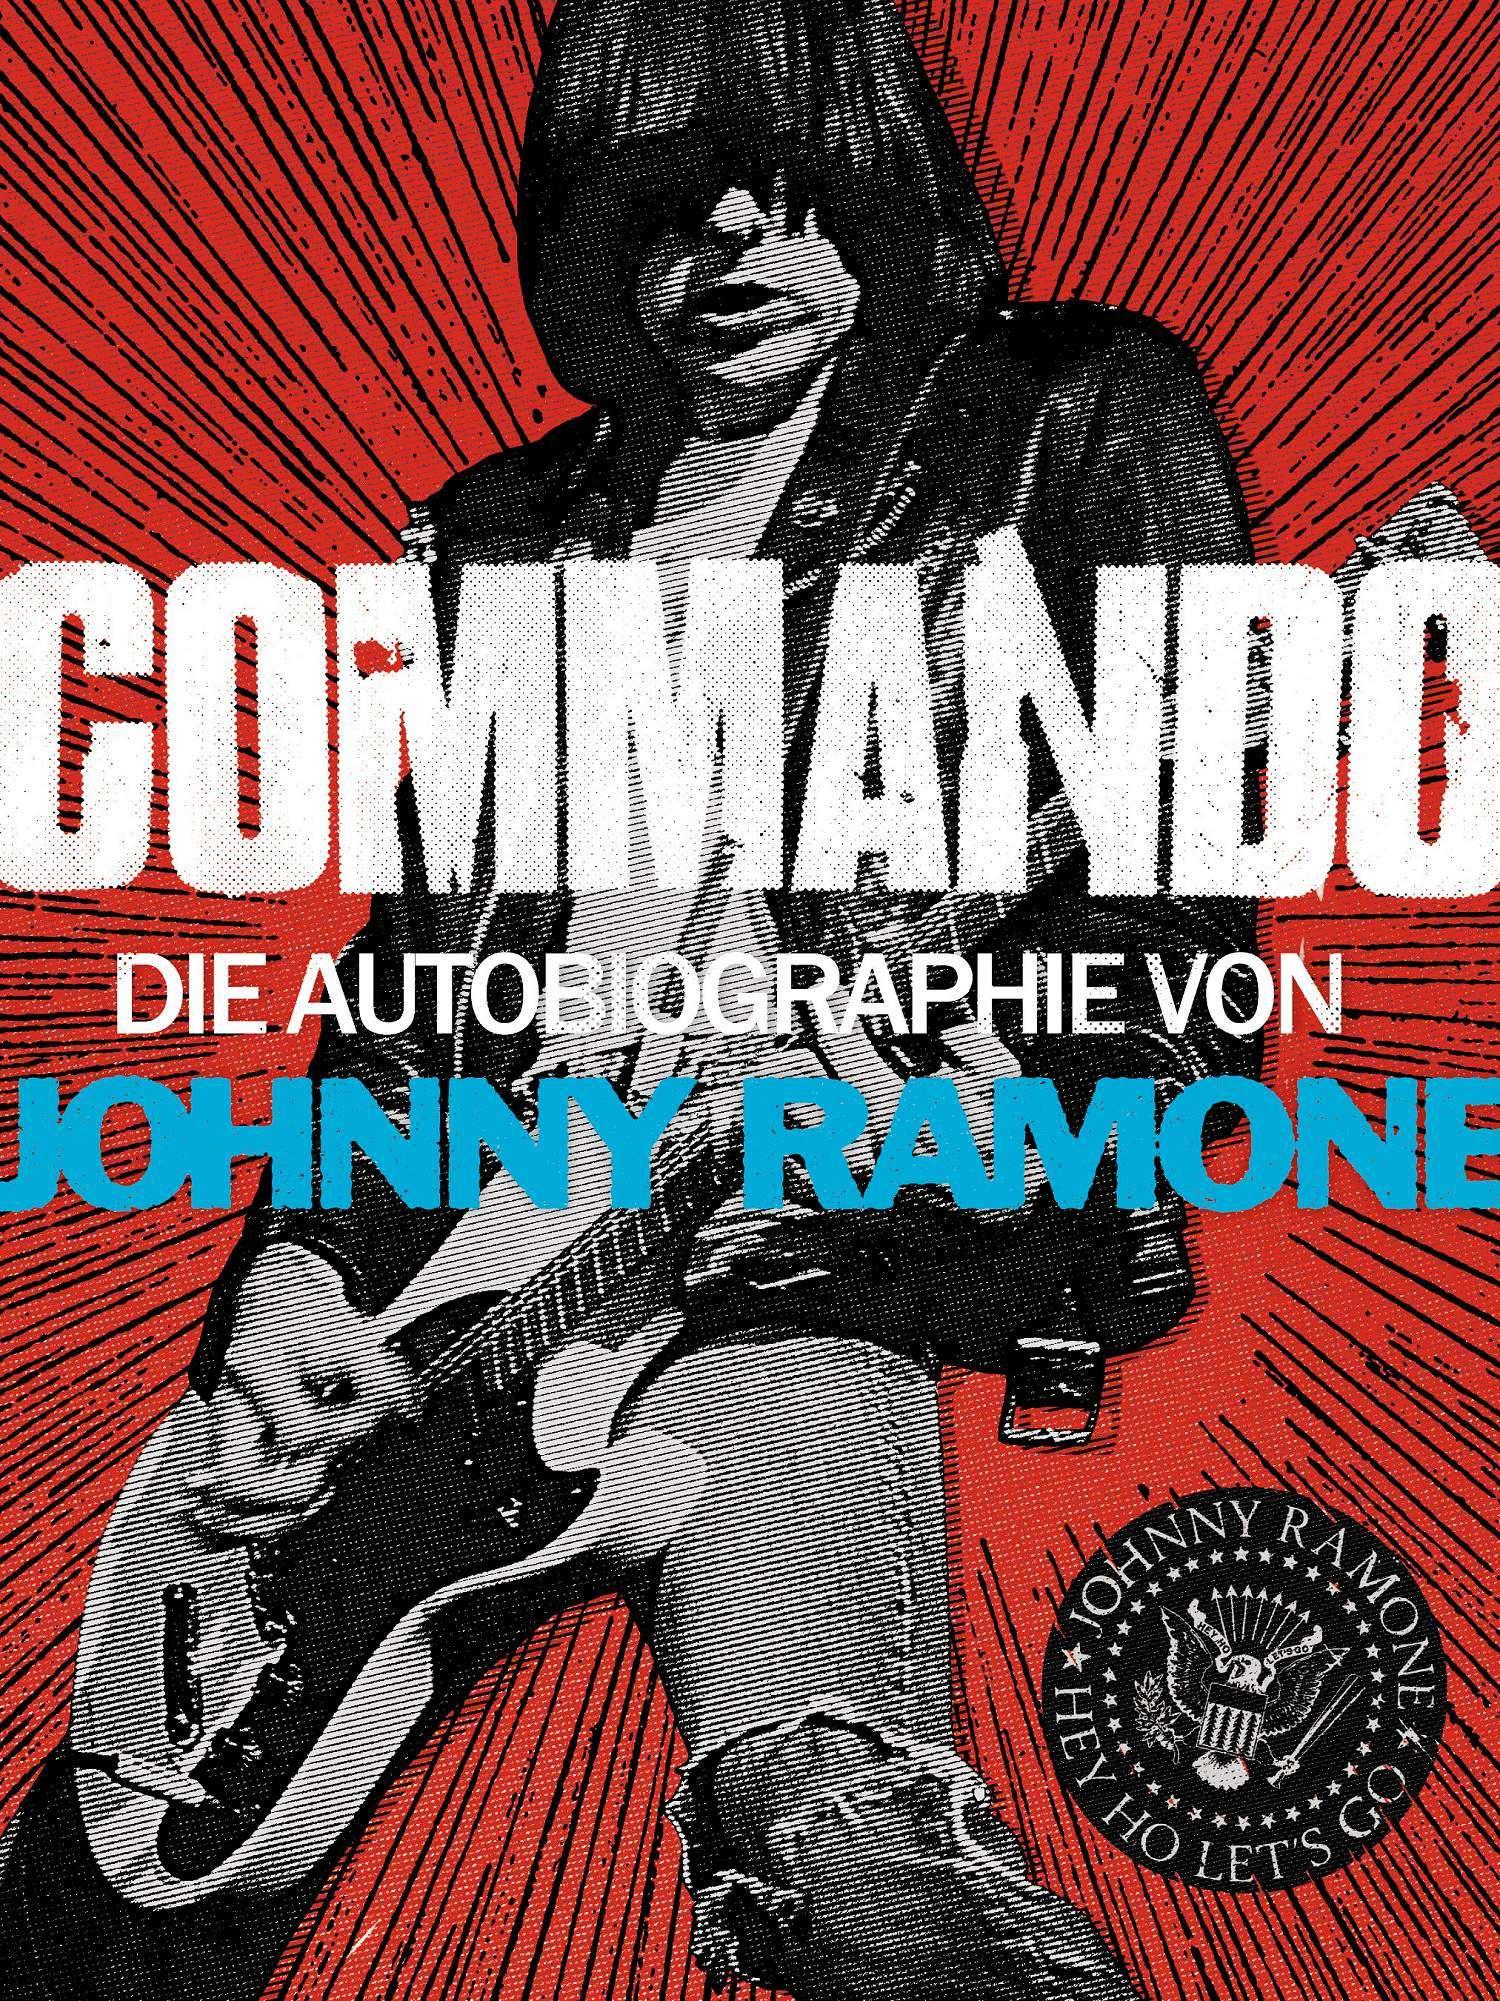 Johnny Ramone 'Commando'